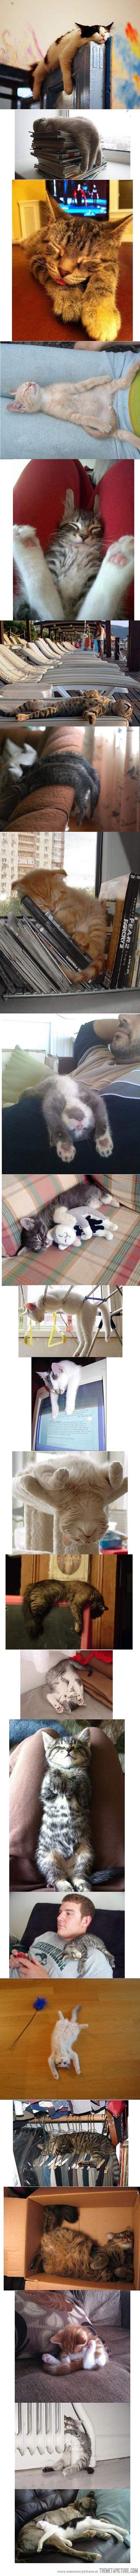 Cats sleep anywhere…